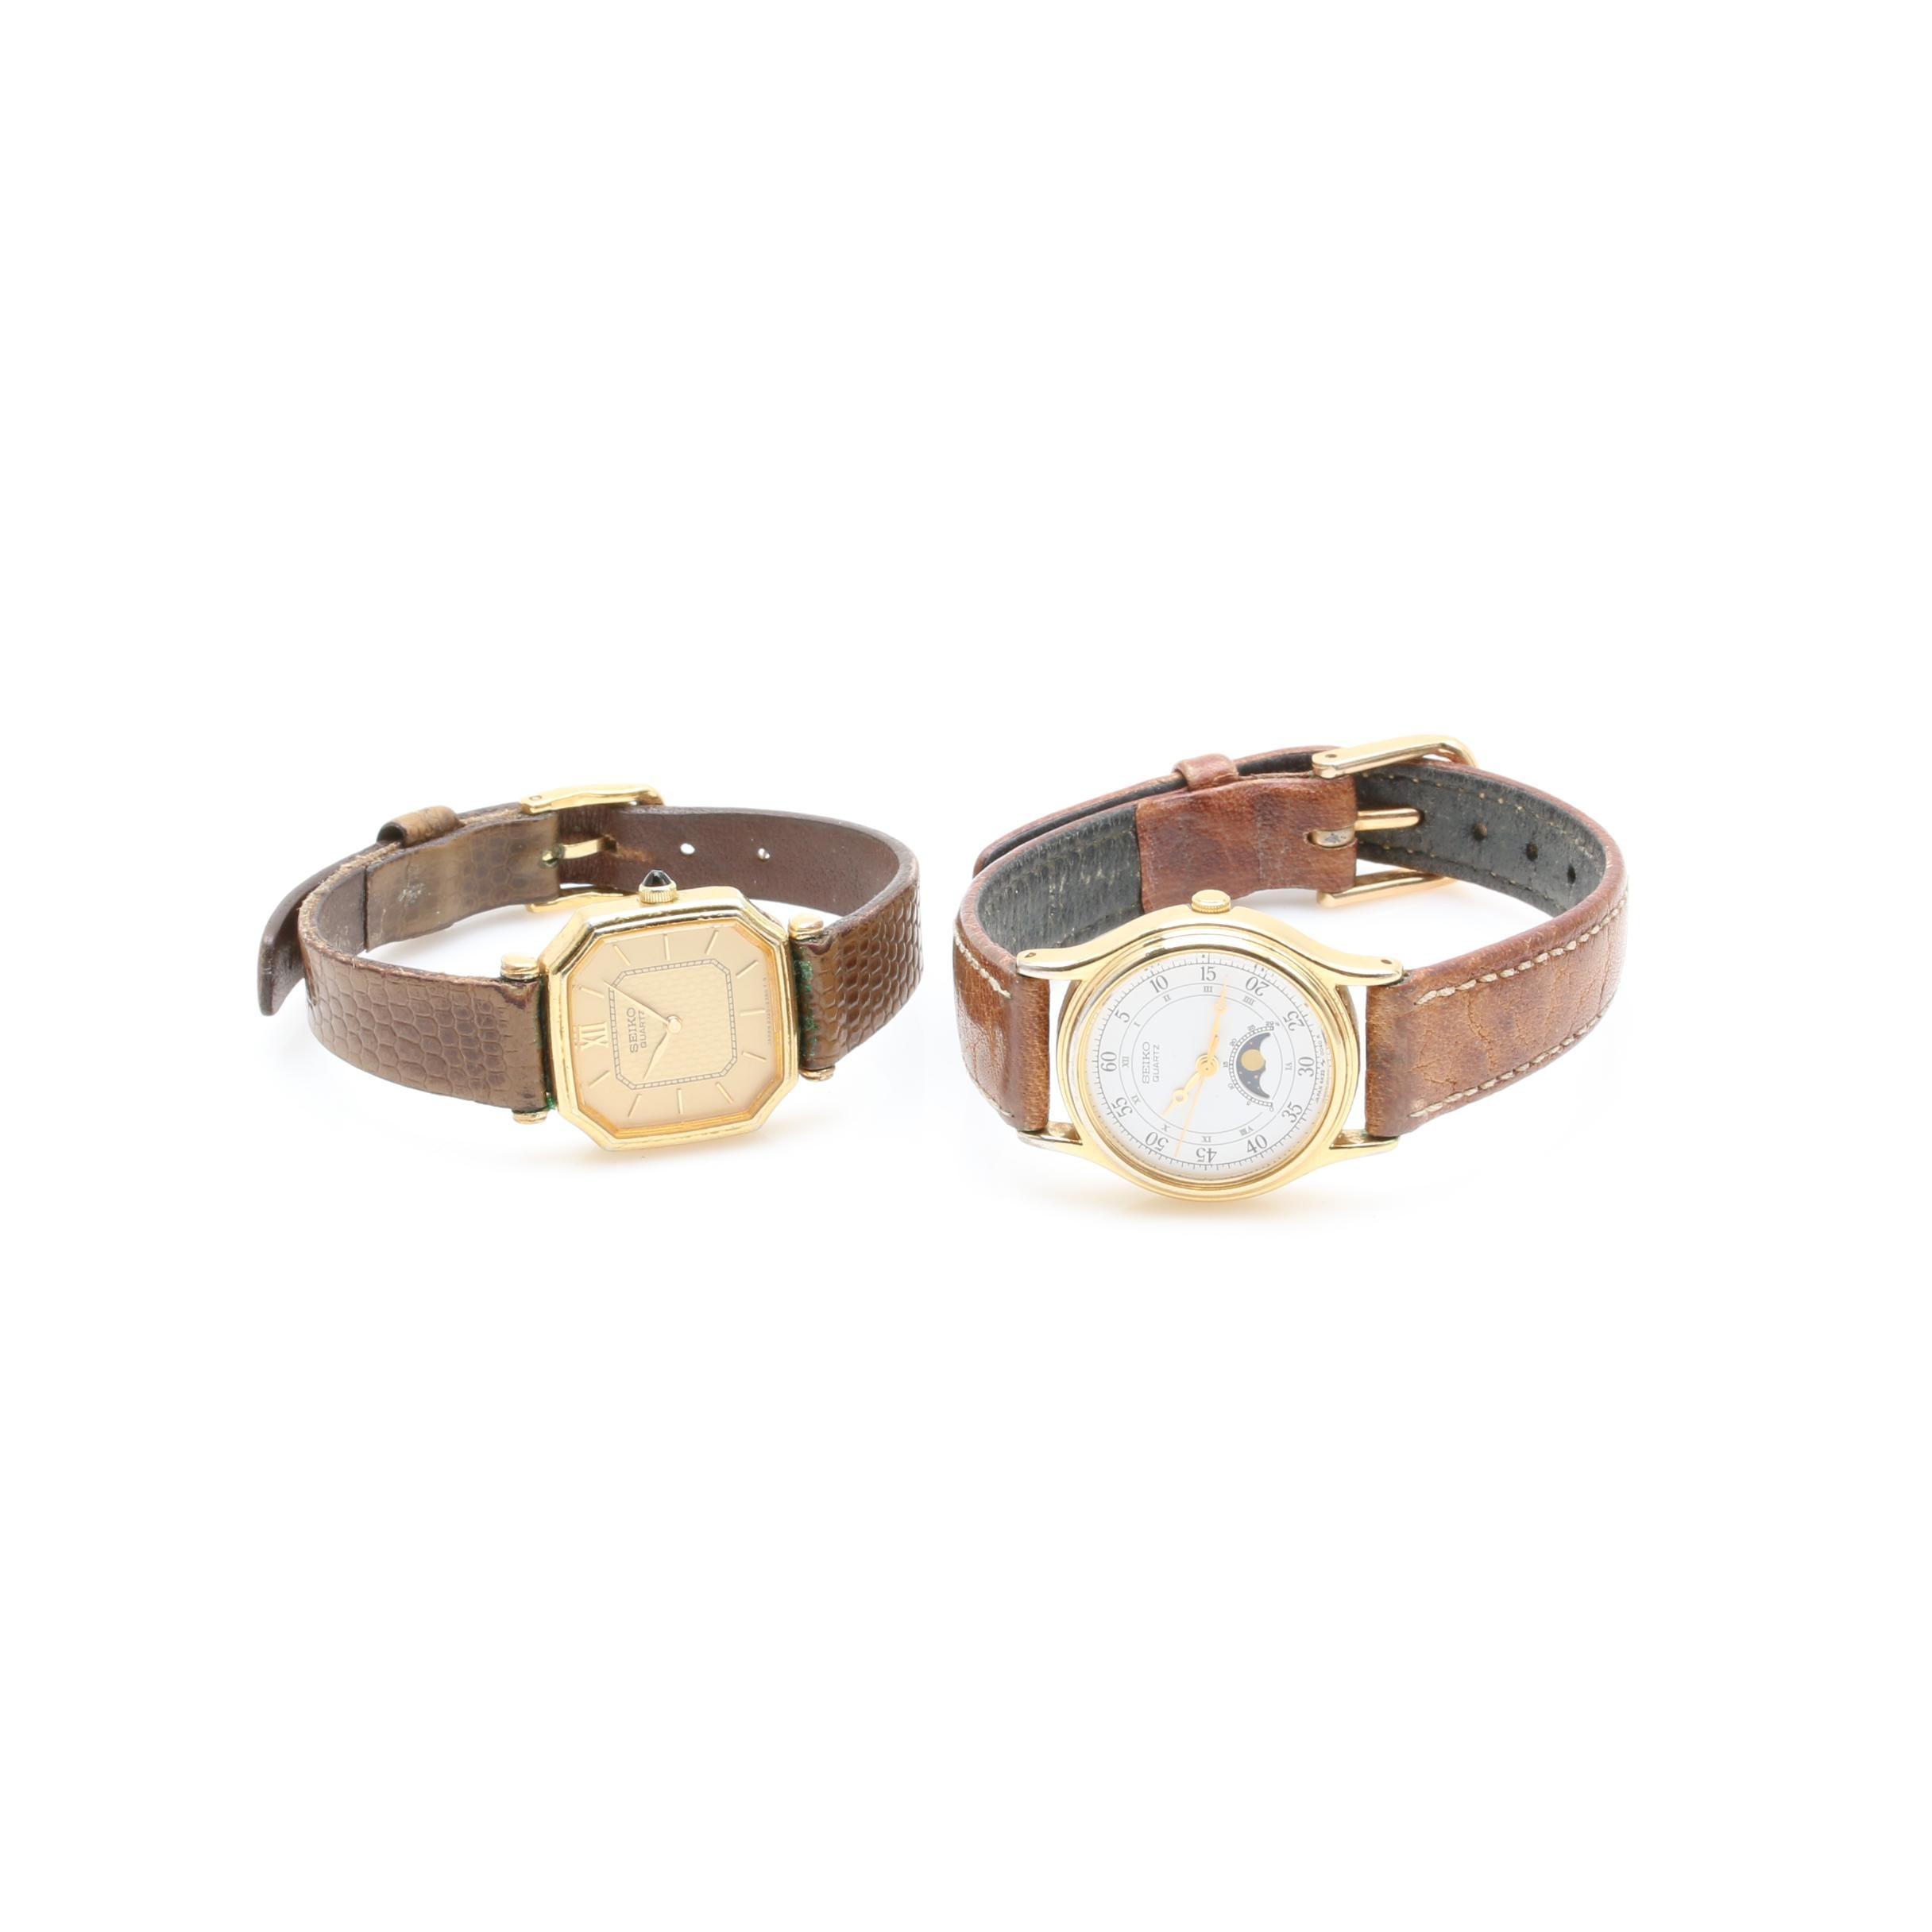 Seiko Gold Tone Wristwatch Assortment